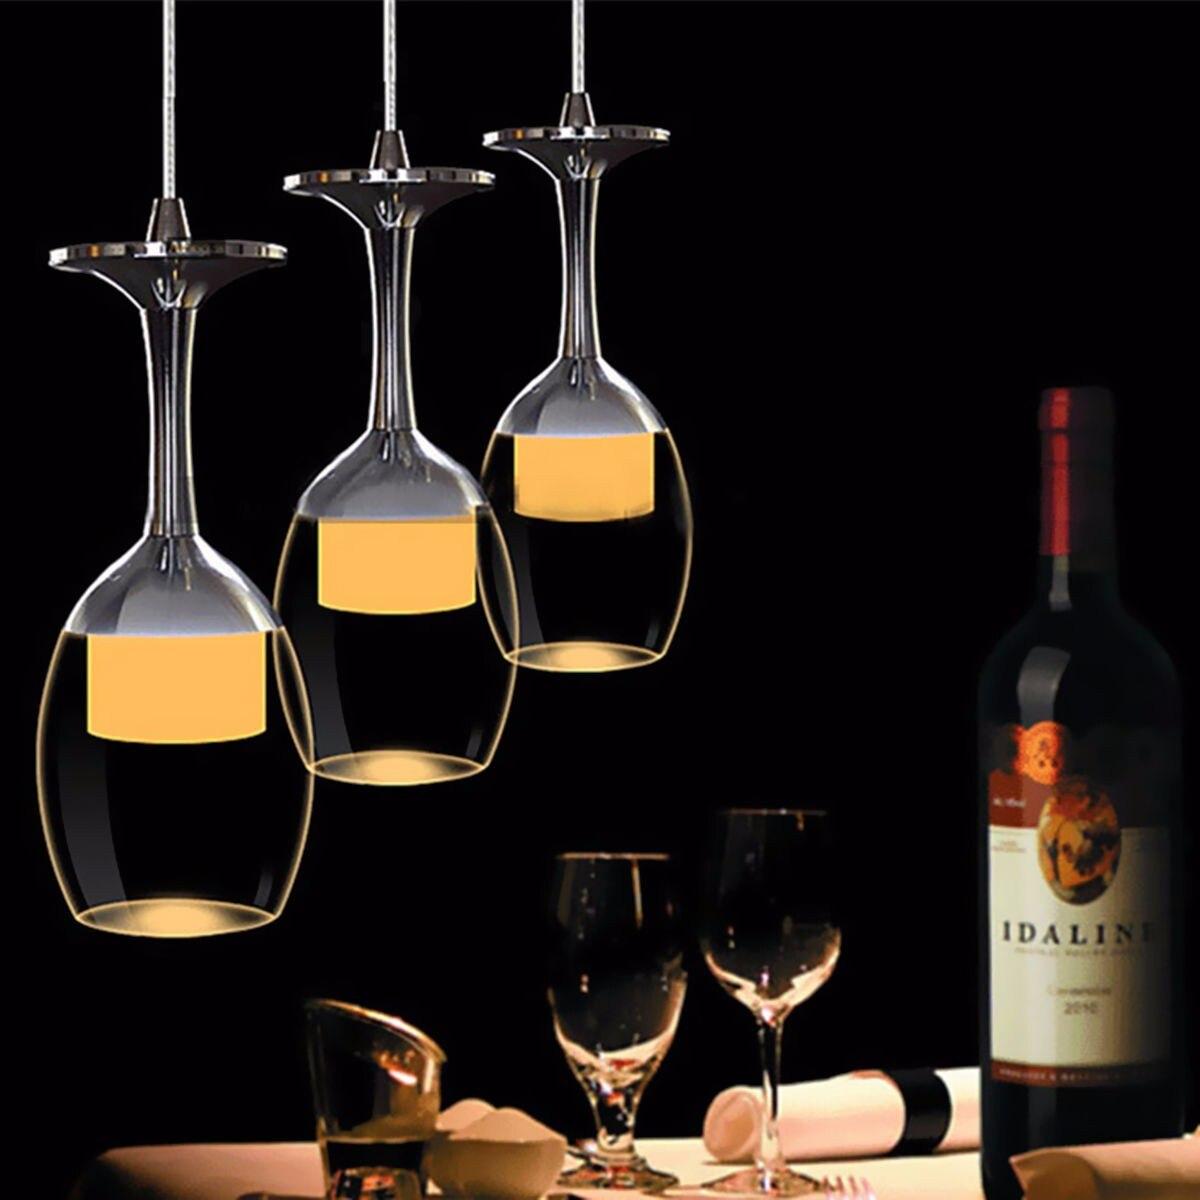 AC 220V LED Wine Glass Bar Light <font><b>Pendant</b></font> Lamp Fixture Lighting Chandelier For Home Dining Room Restaurant Cafe High Quality